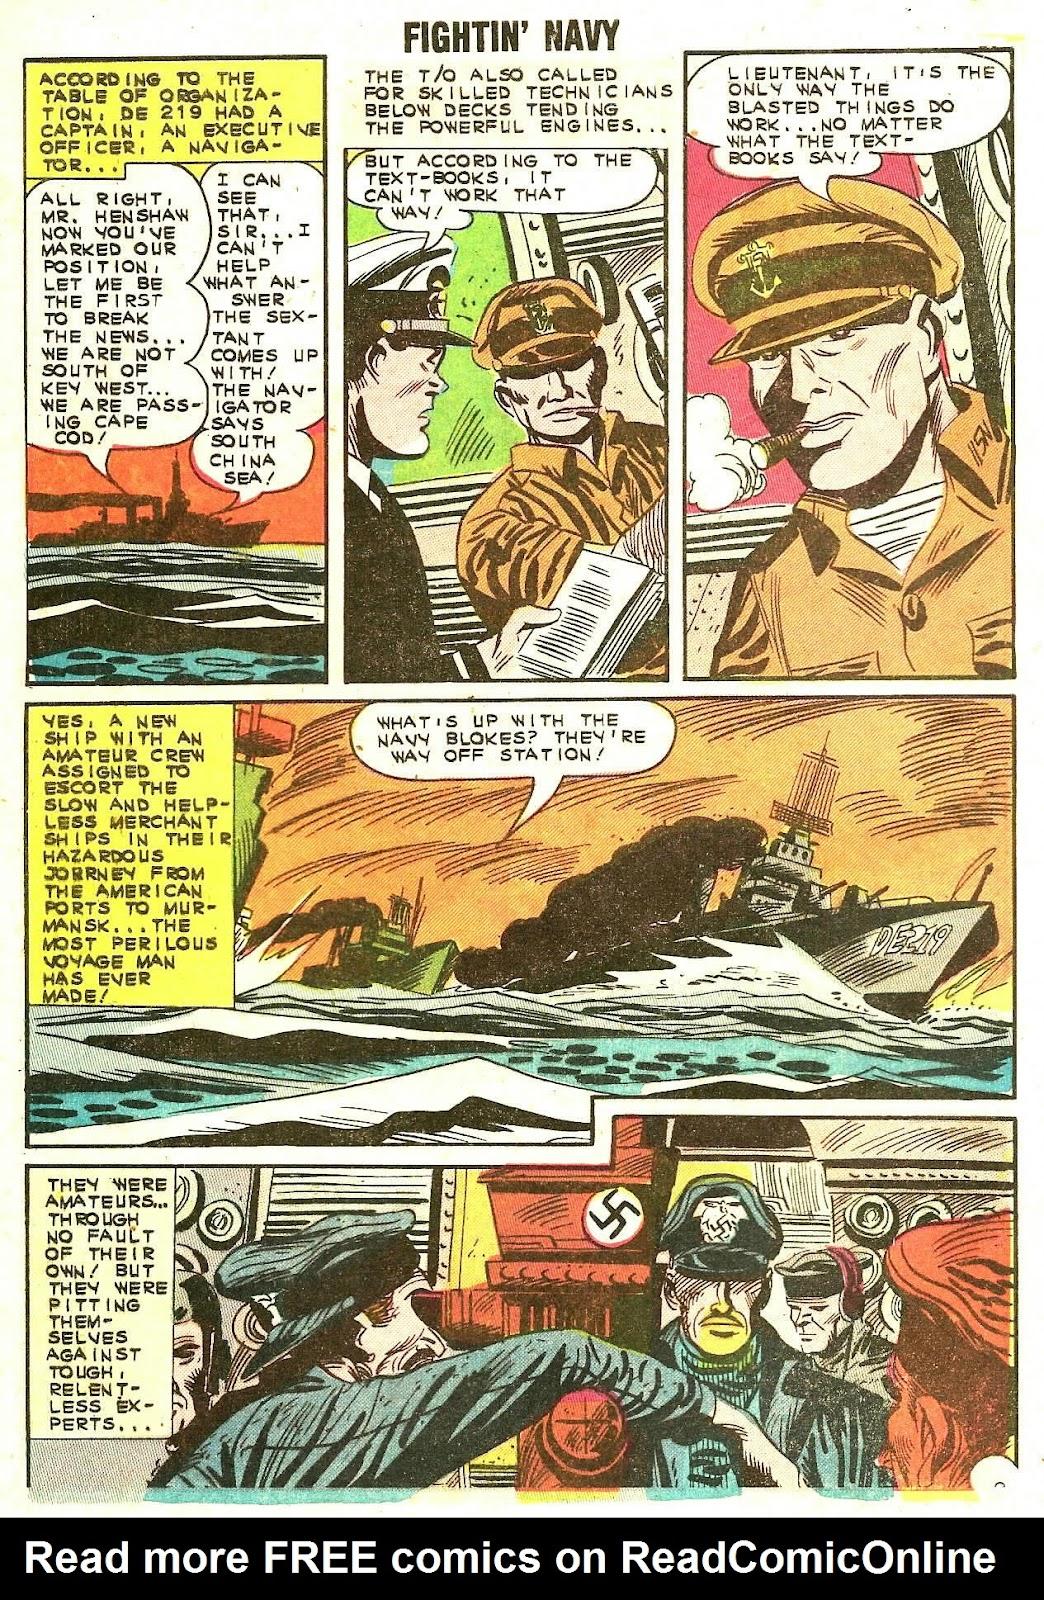 Read online Fightin' Navy comic -  Issue #110 - 33